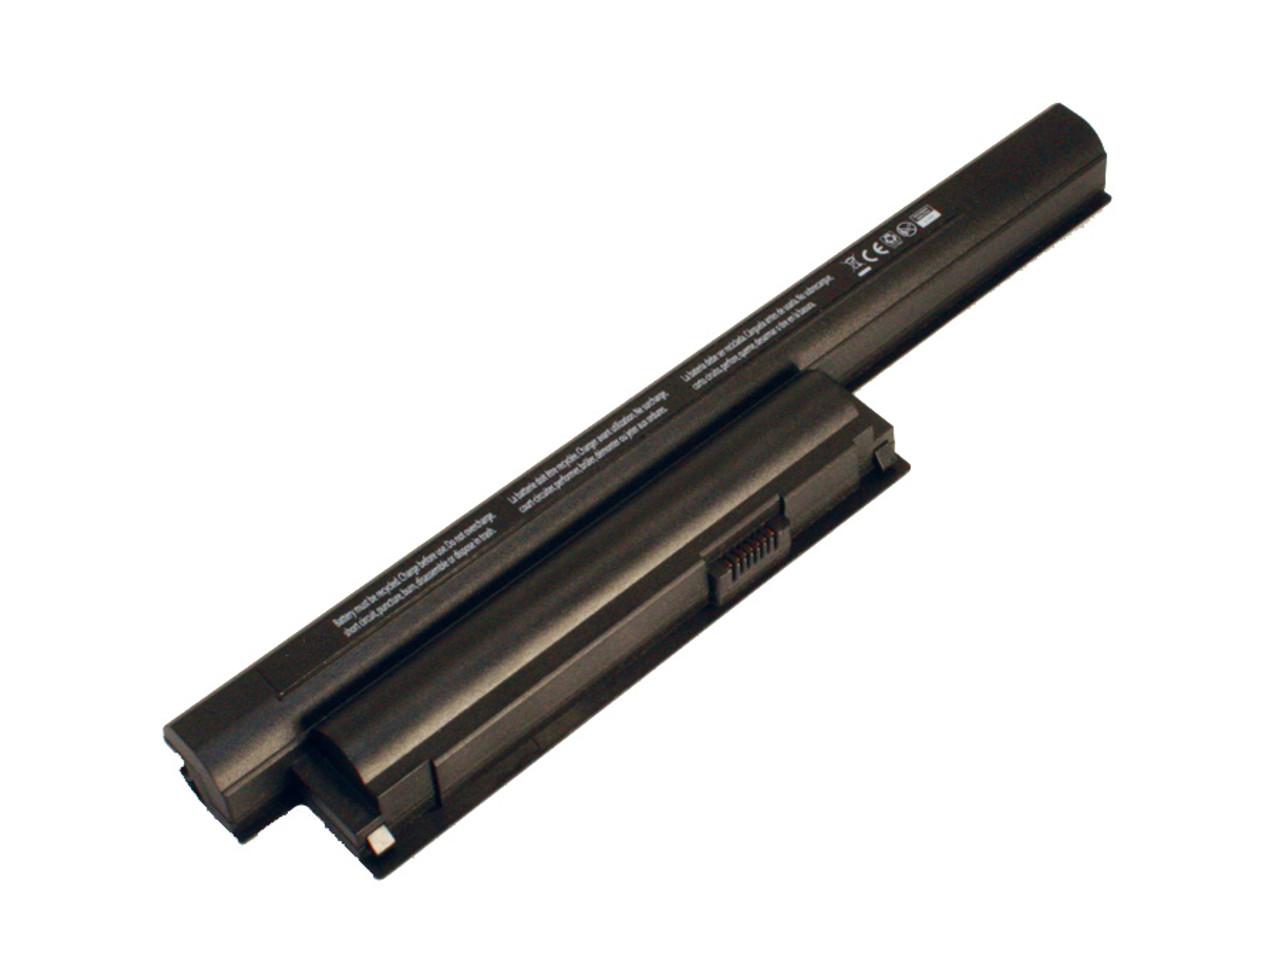 Sony VAIO VGP-BPS26 battery